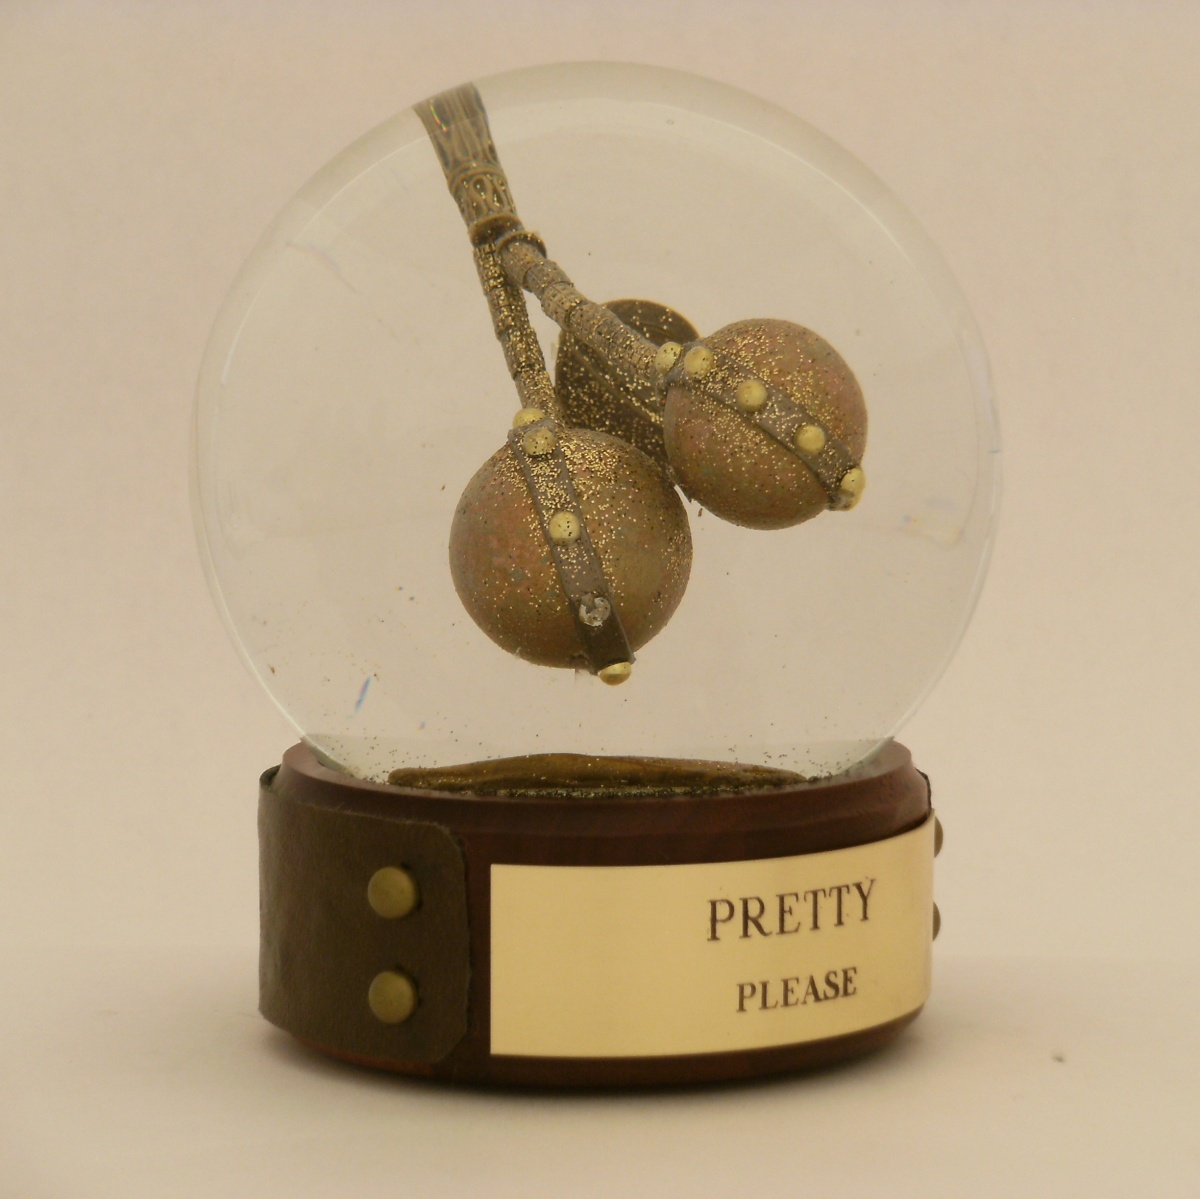 Pretty Please with Cherries, Camryn Forrest Designs